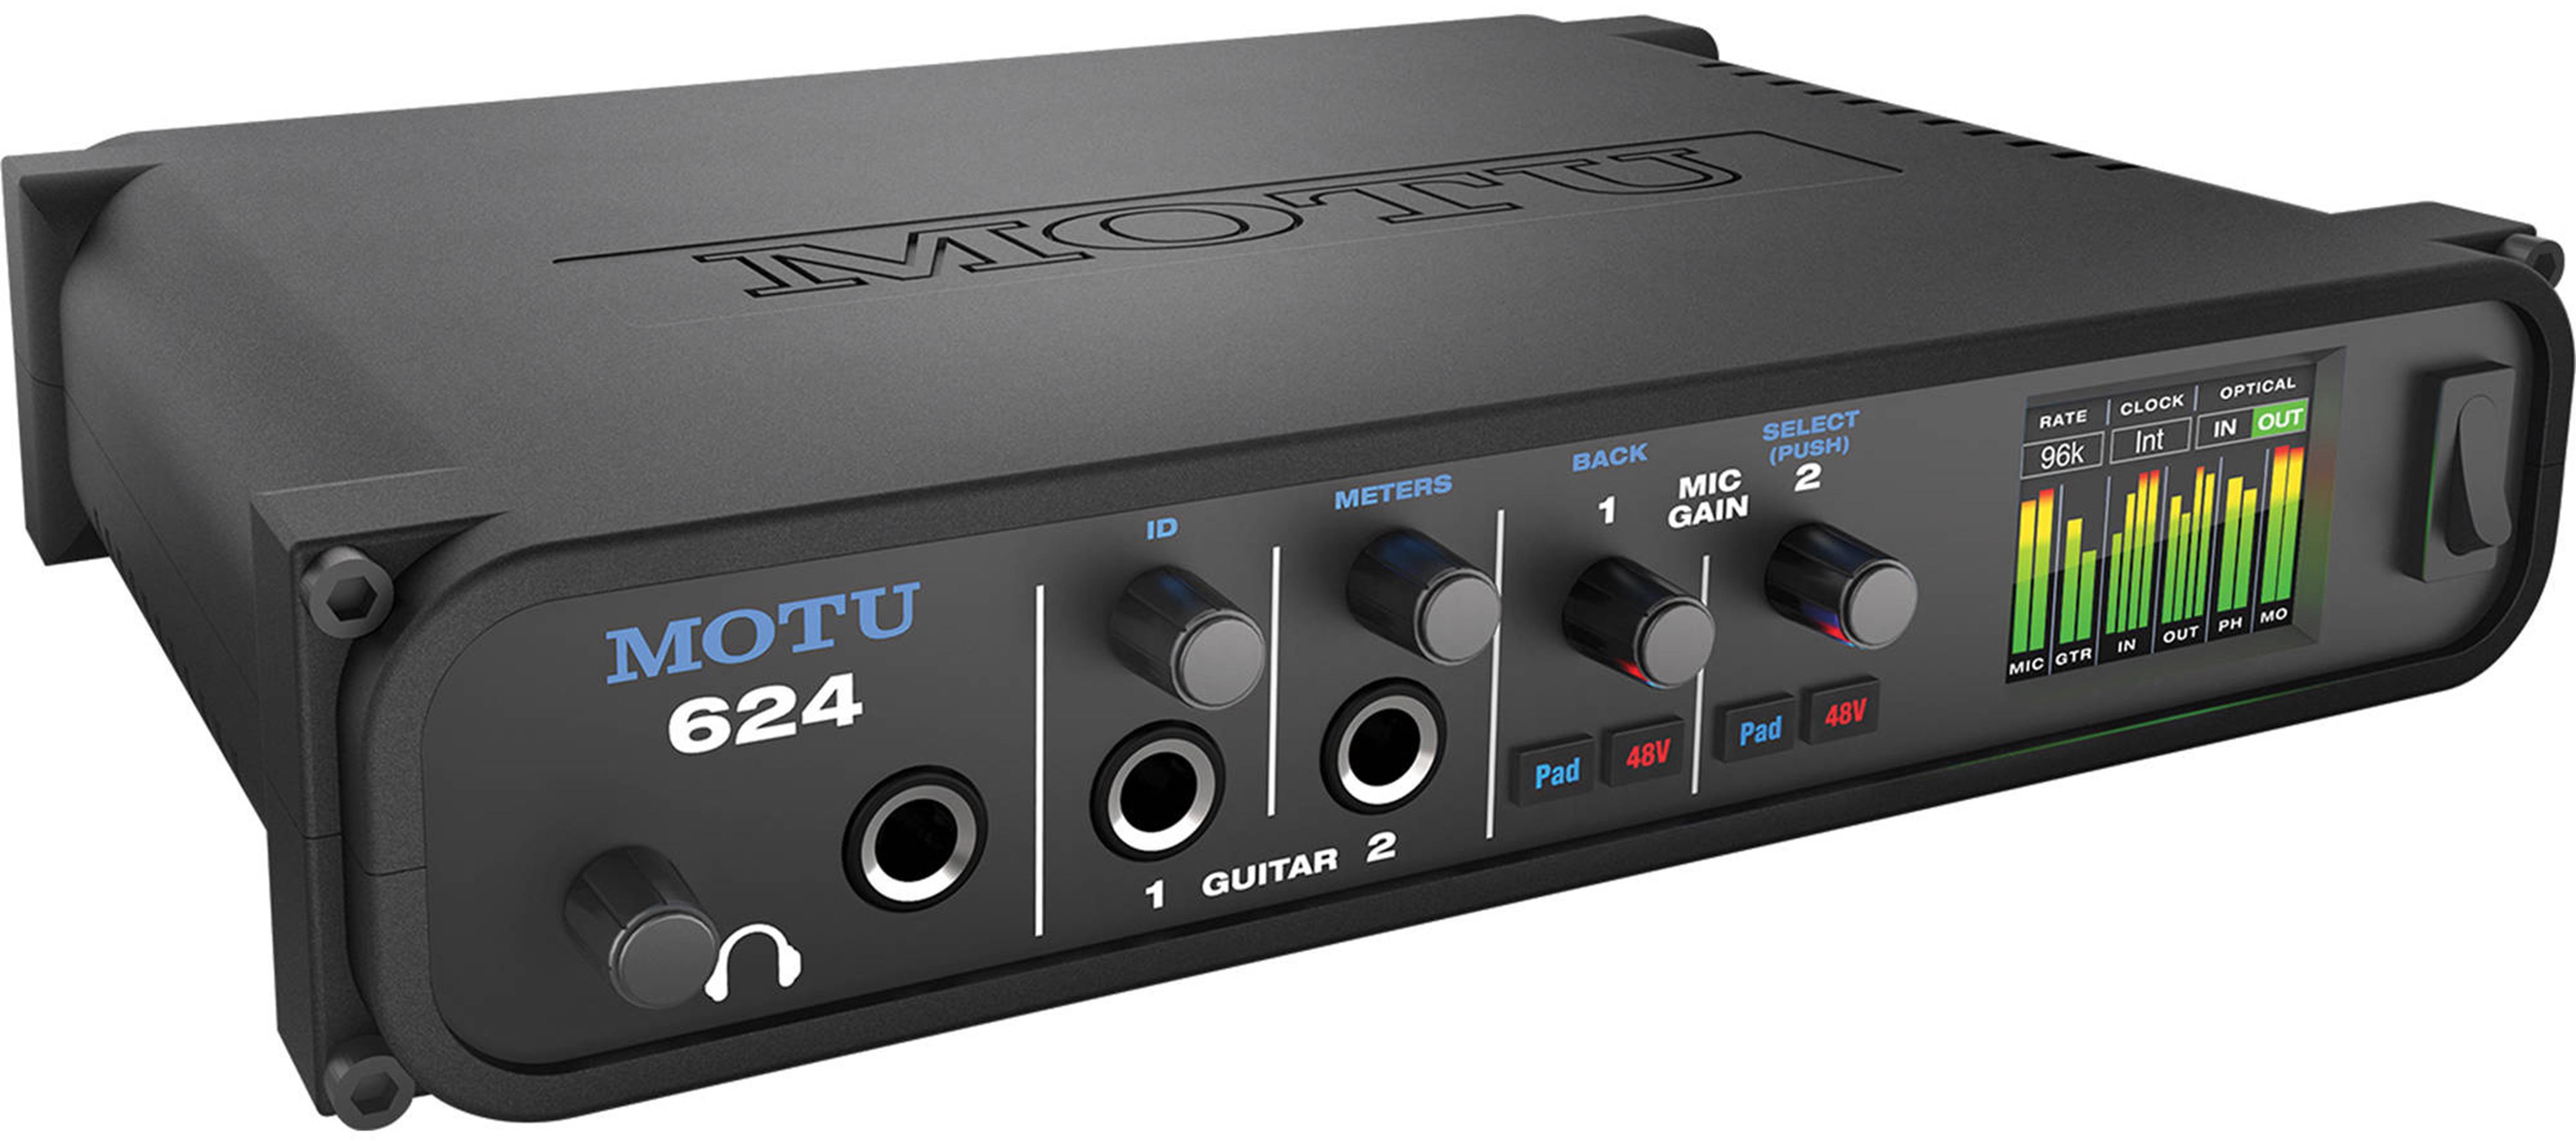 MOTU 624 AVB INTERFACCIA AUDIO USB3 / AVB / THUNDERBOLT